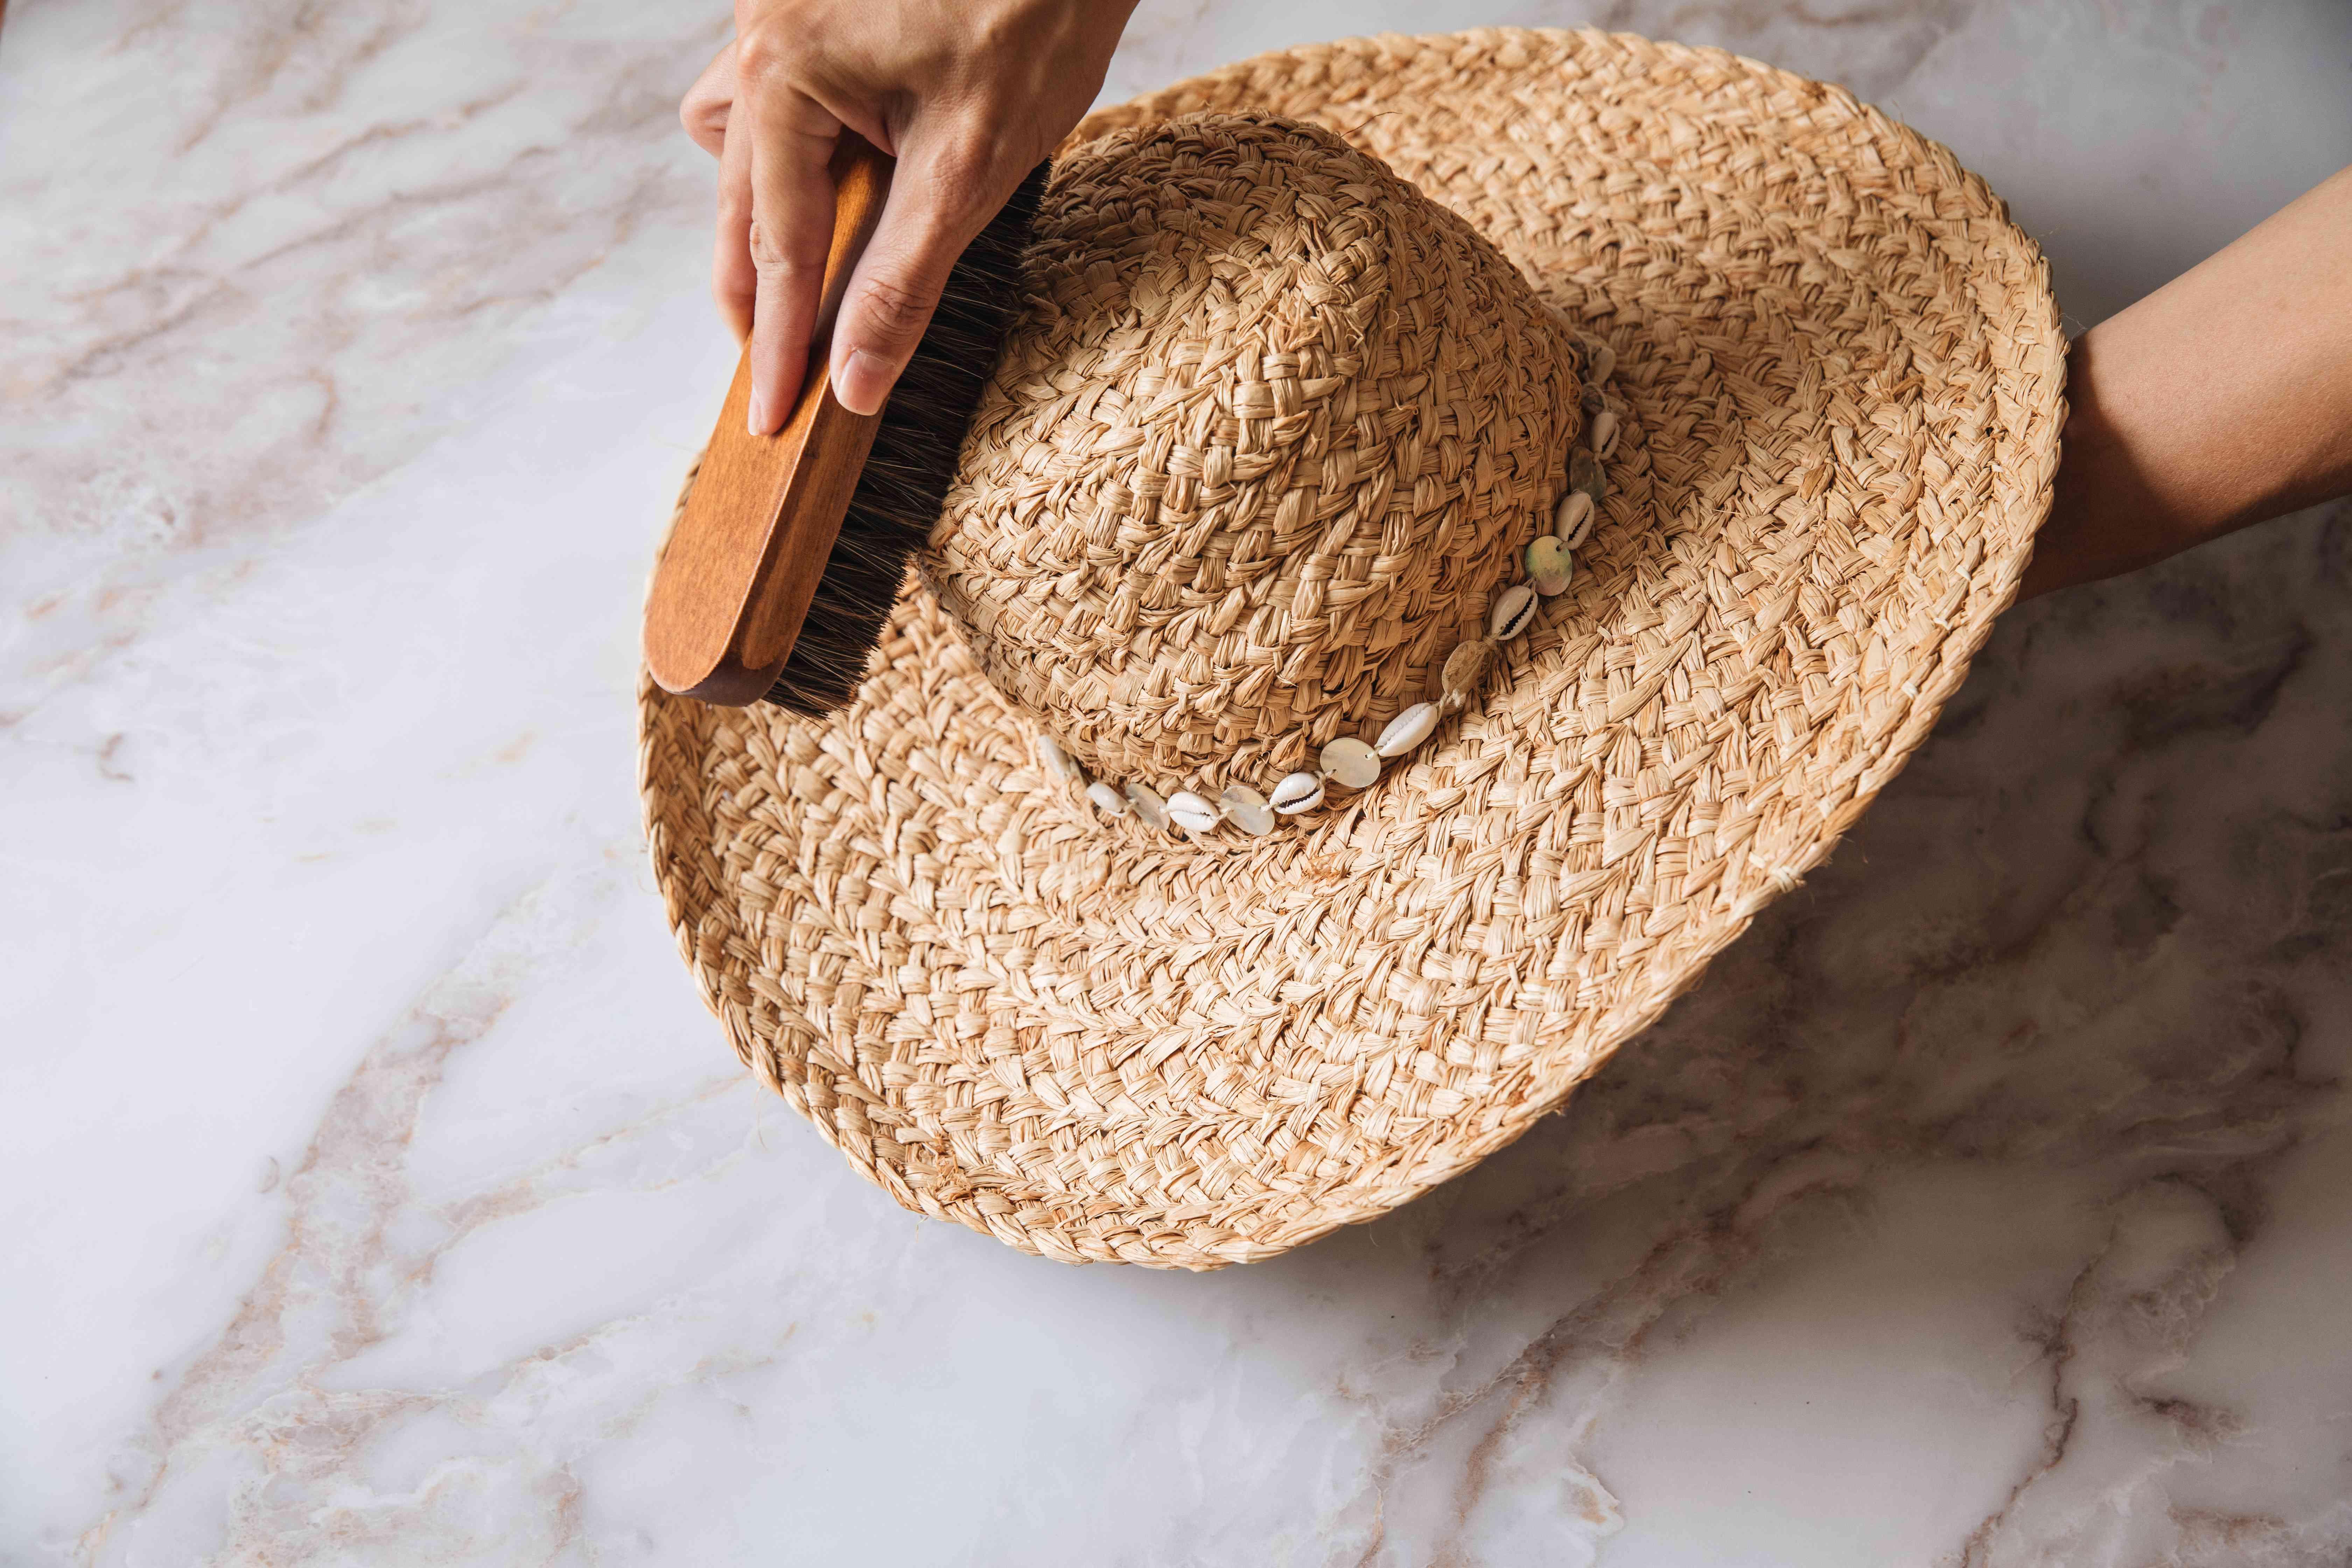 Someone brushing a straw hat